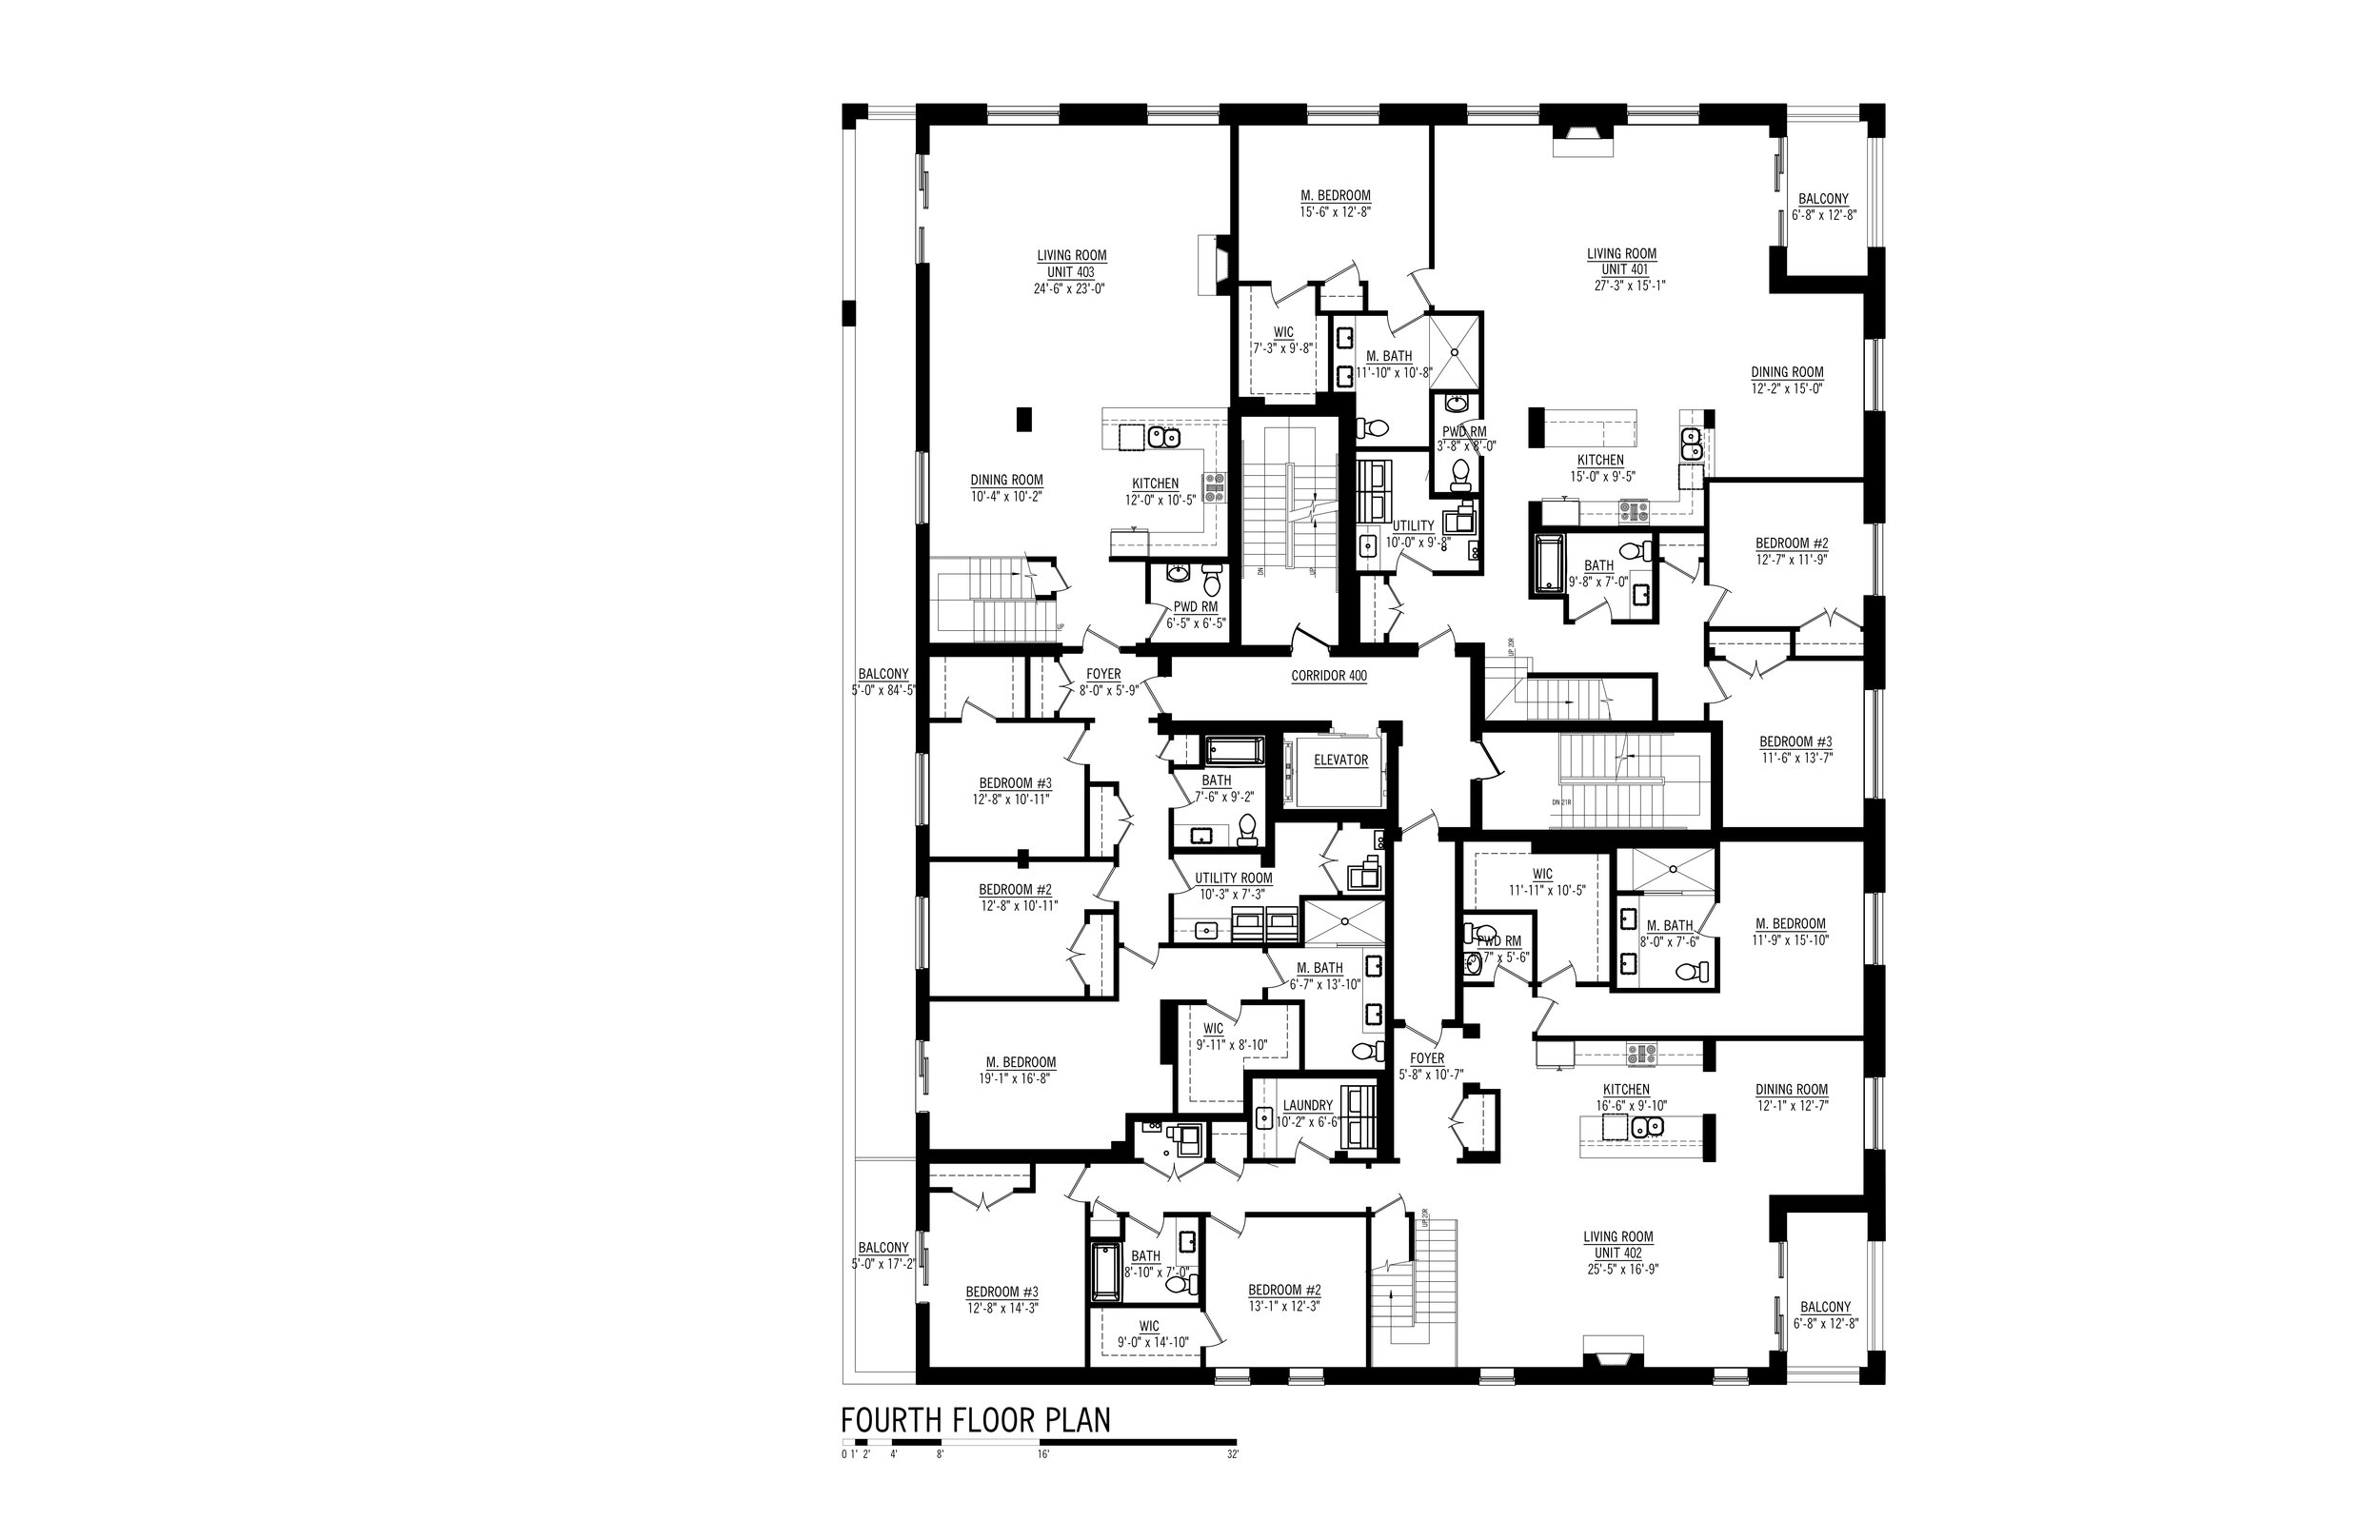 3150 SOUTHPORT - Final Marketing Plans 81618-4.jpg